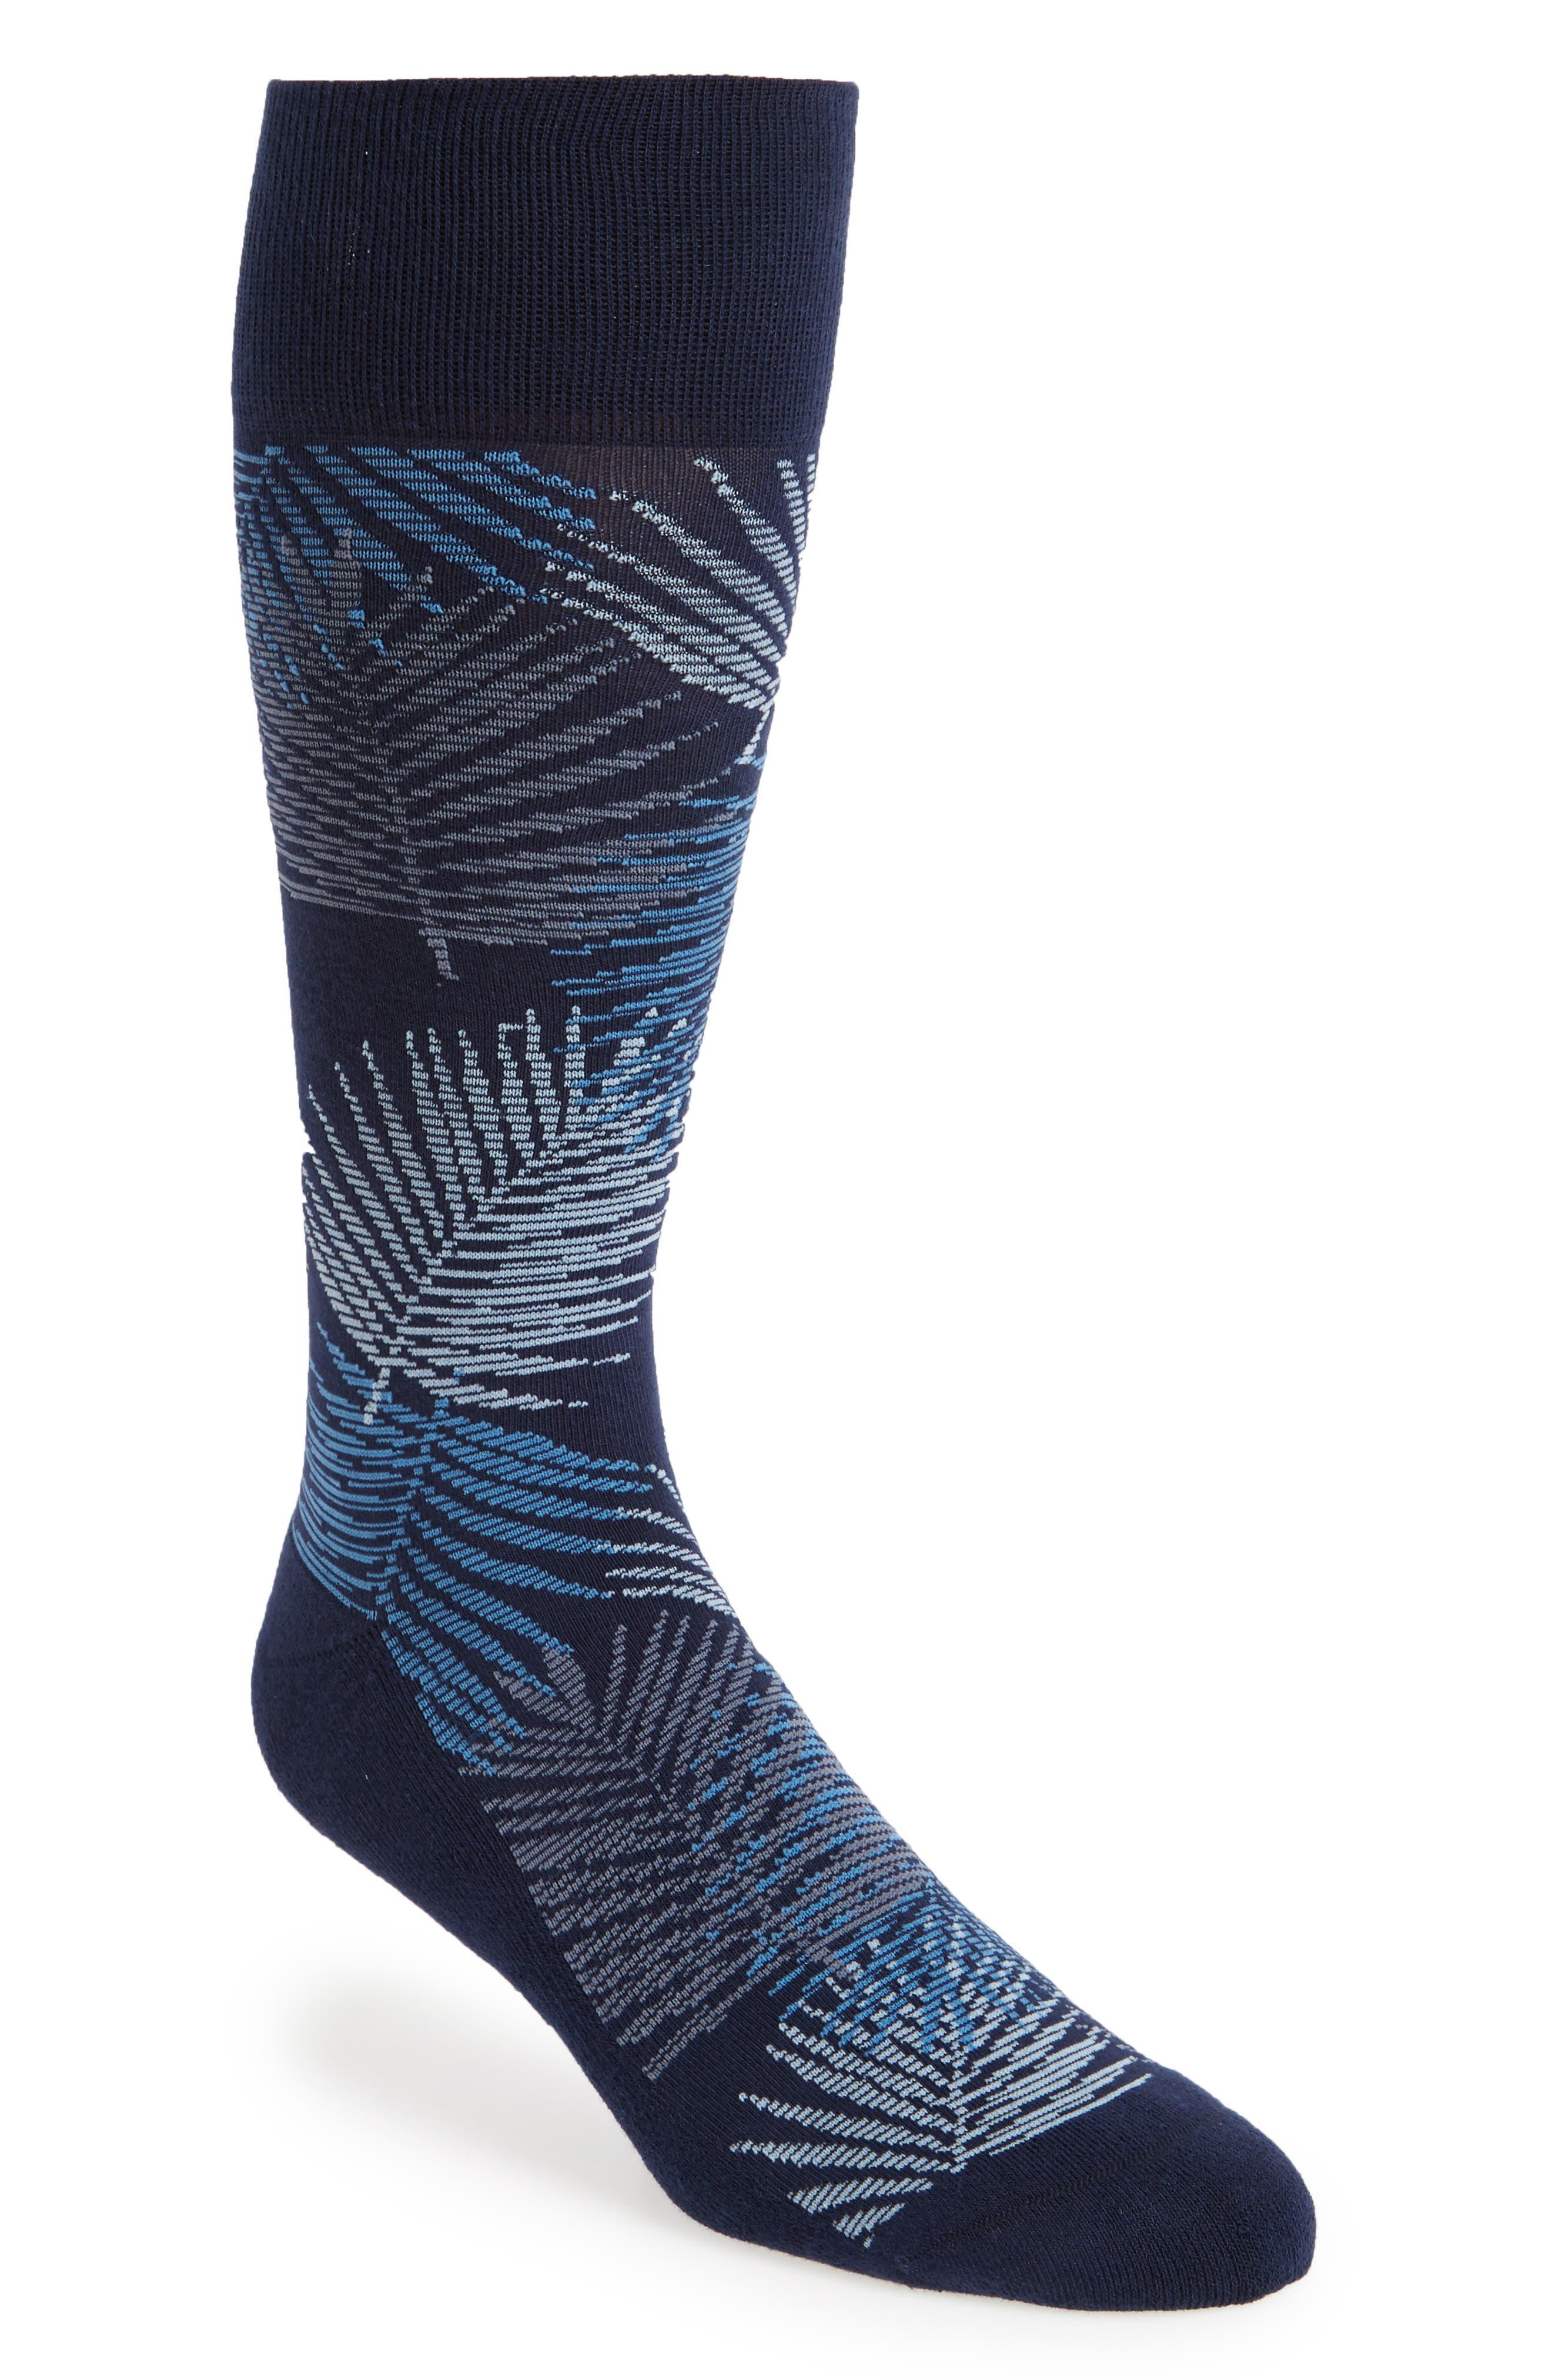 Evening Palm Frond Socks,                             Main thumbnail 1, color,                             NAVY/ BLUE